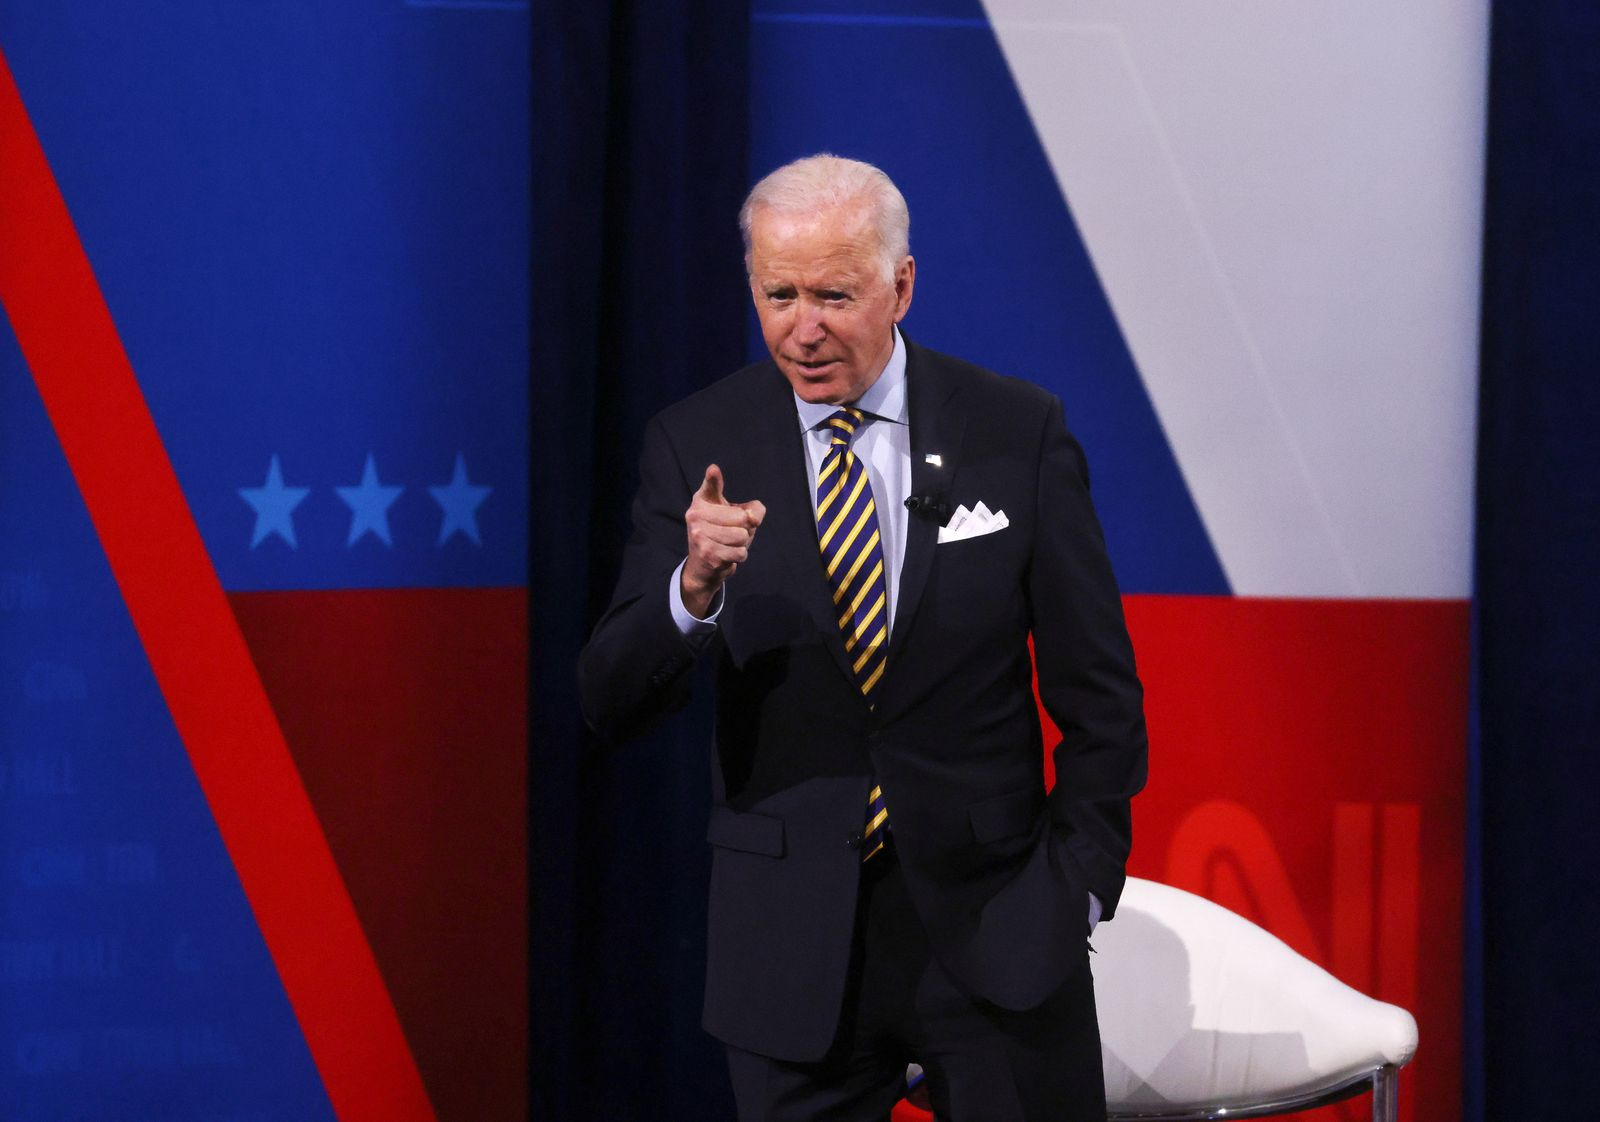 U.S. President Joe Biden participates in a CNN town hall in Milwaukee